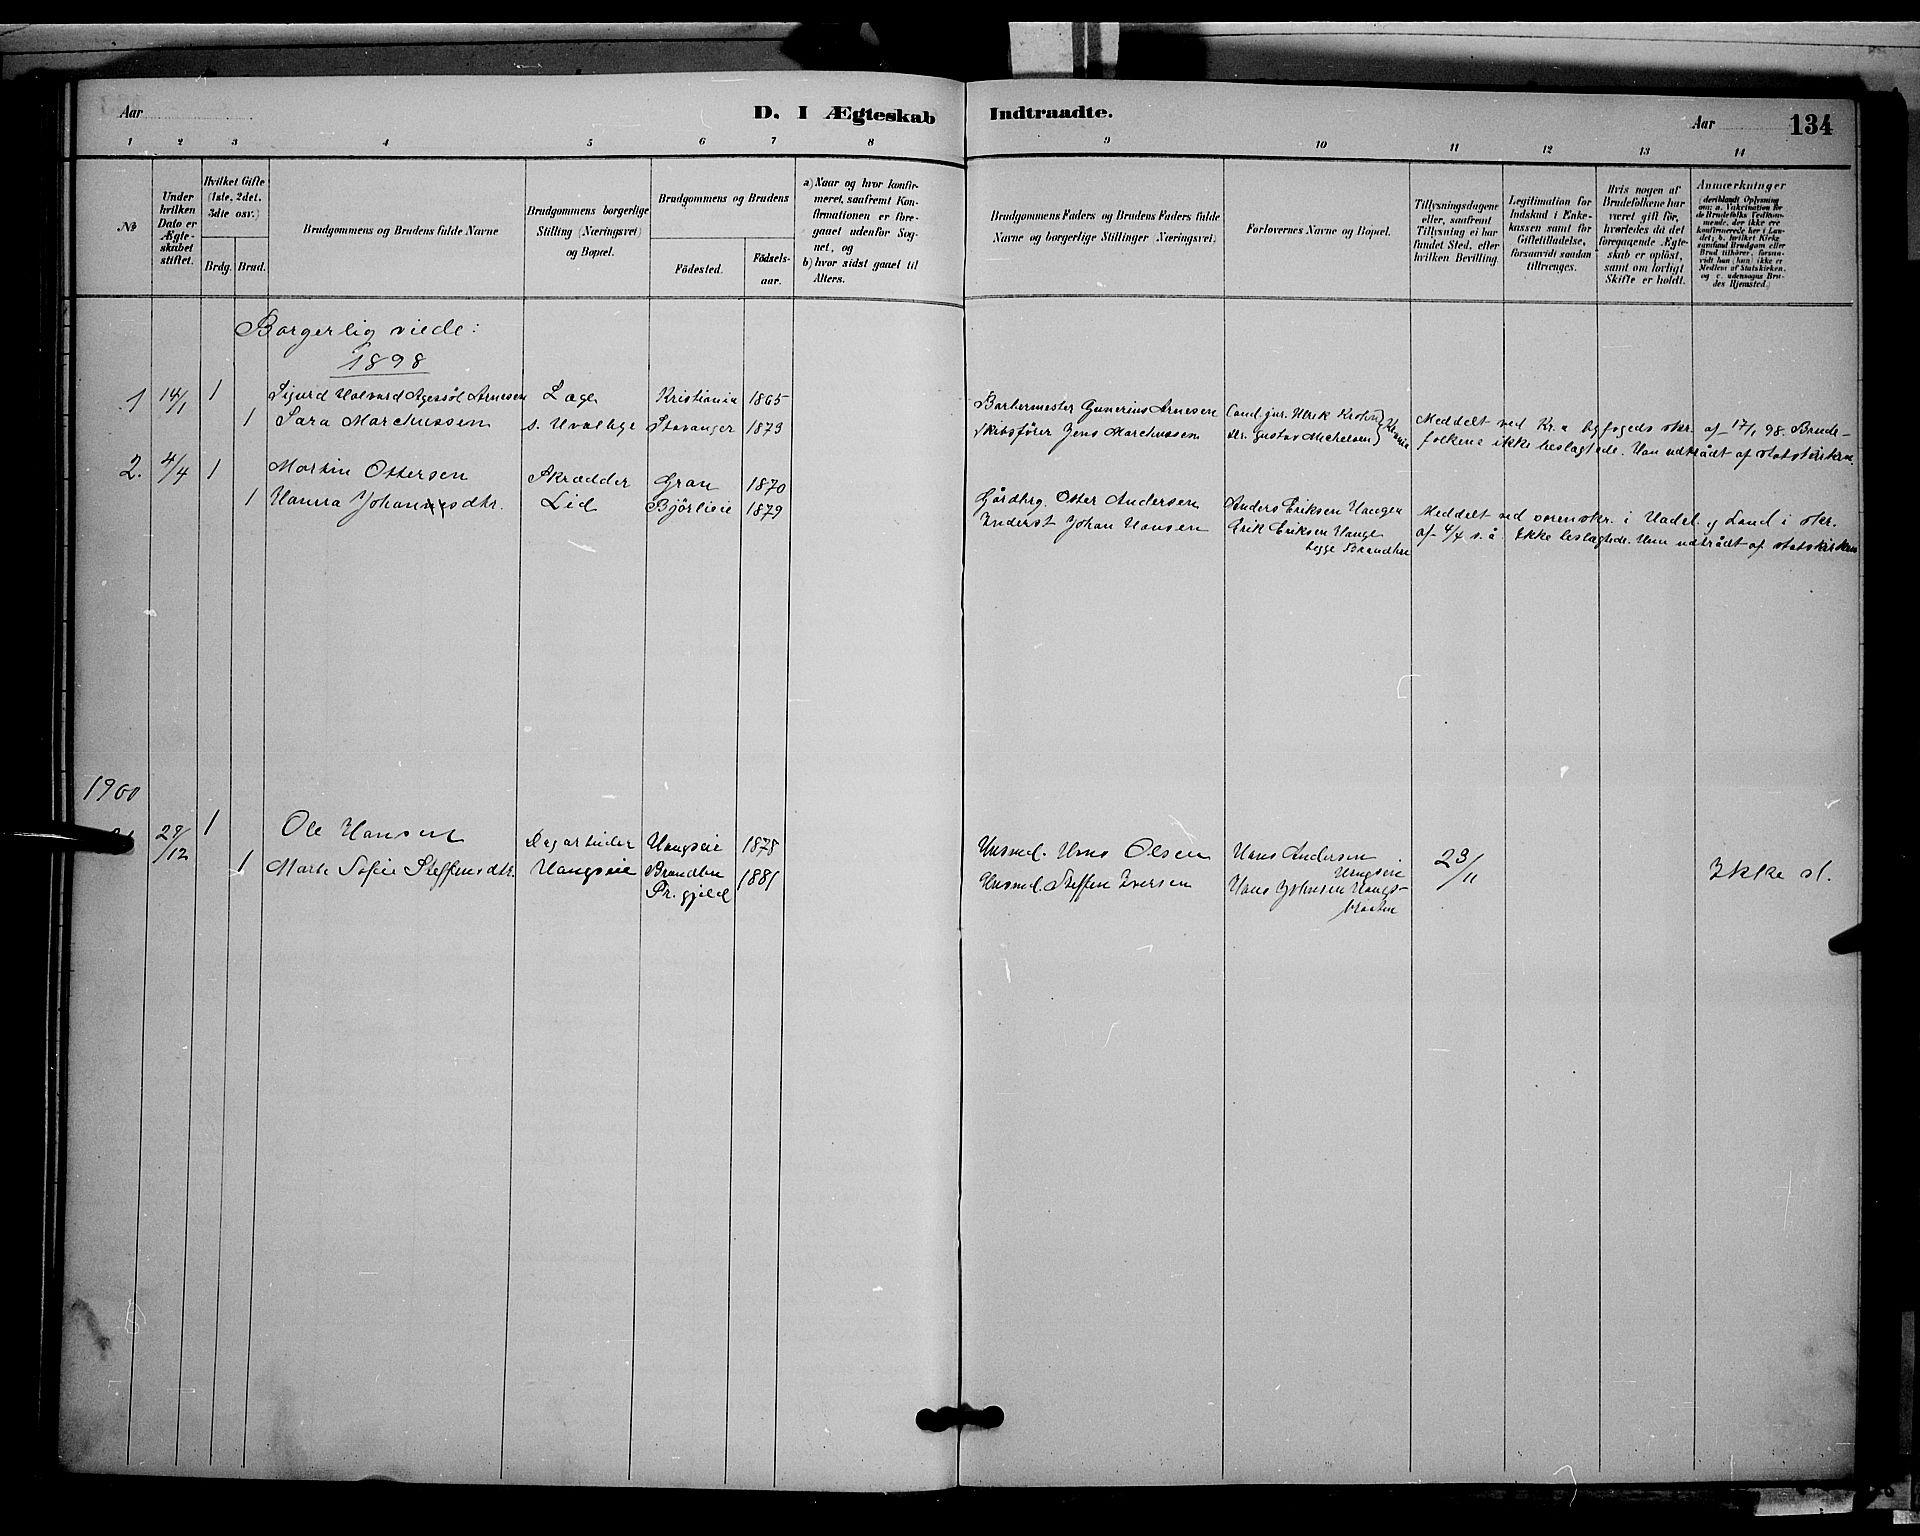 SAH, Søndre Land prestekontor, L/L0002: Klokkerbok nr. 2, 1884-1900, s. 134